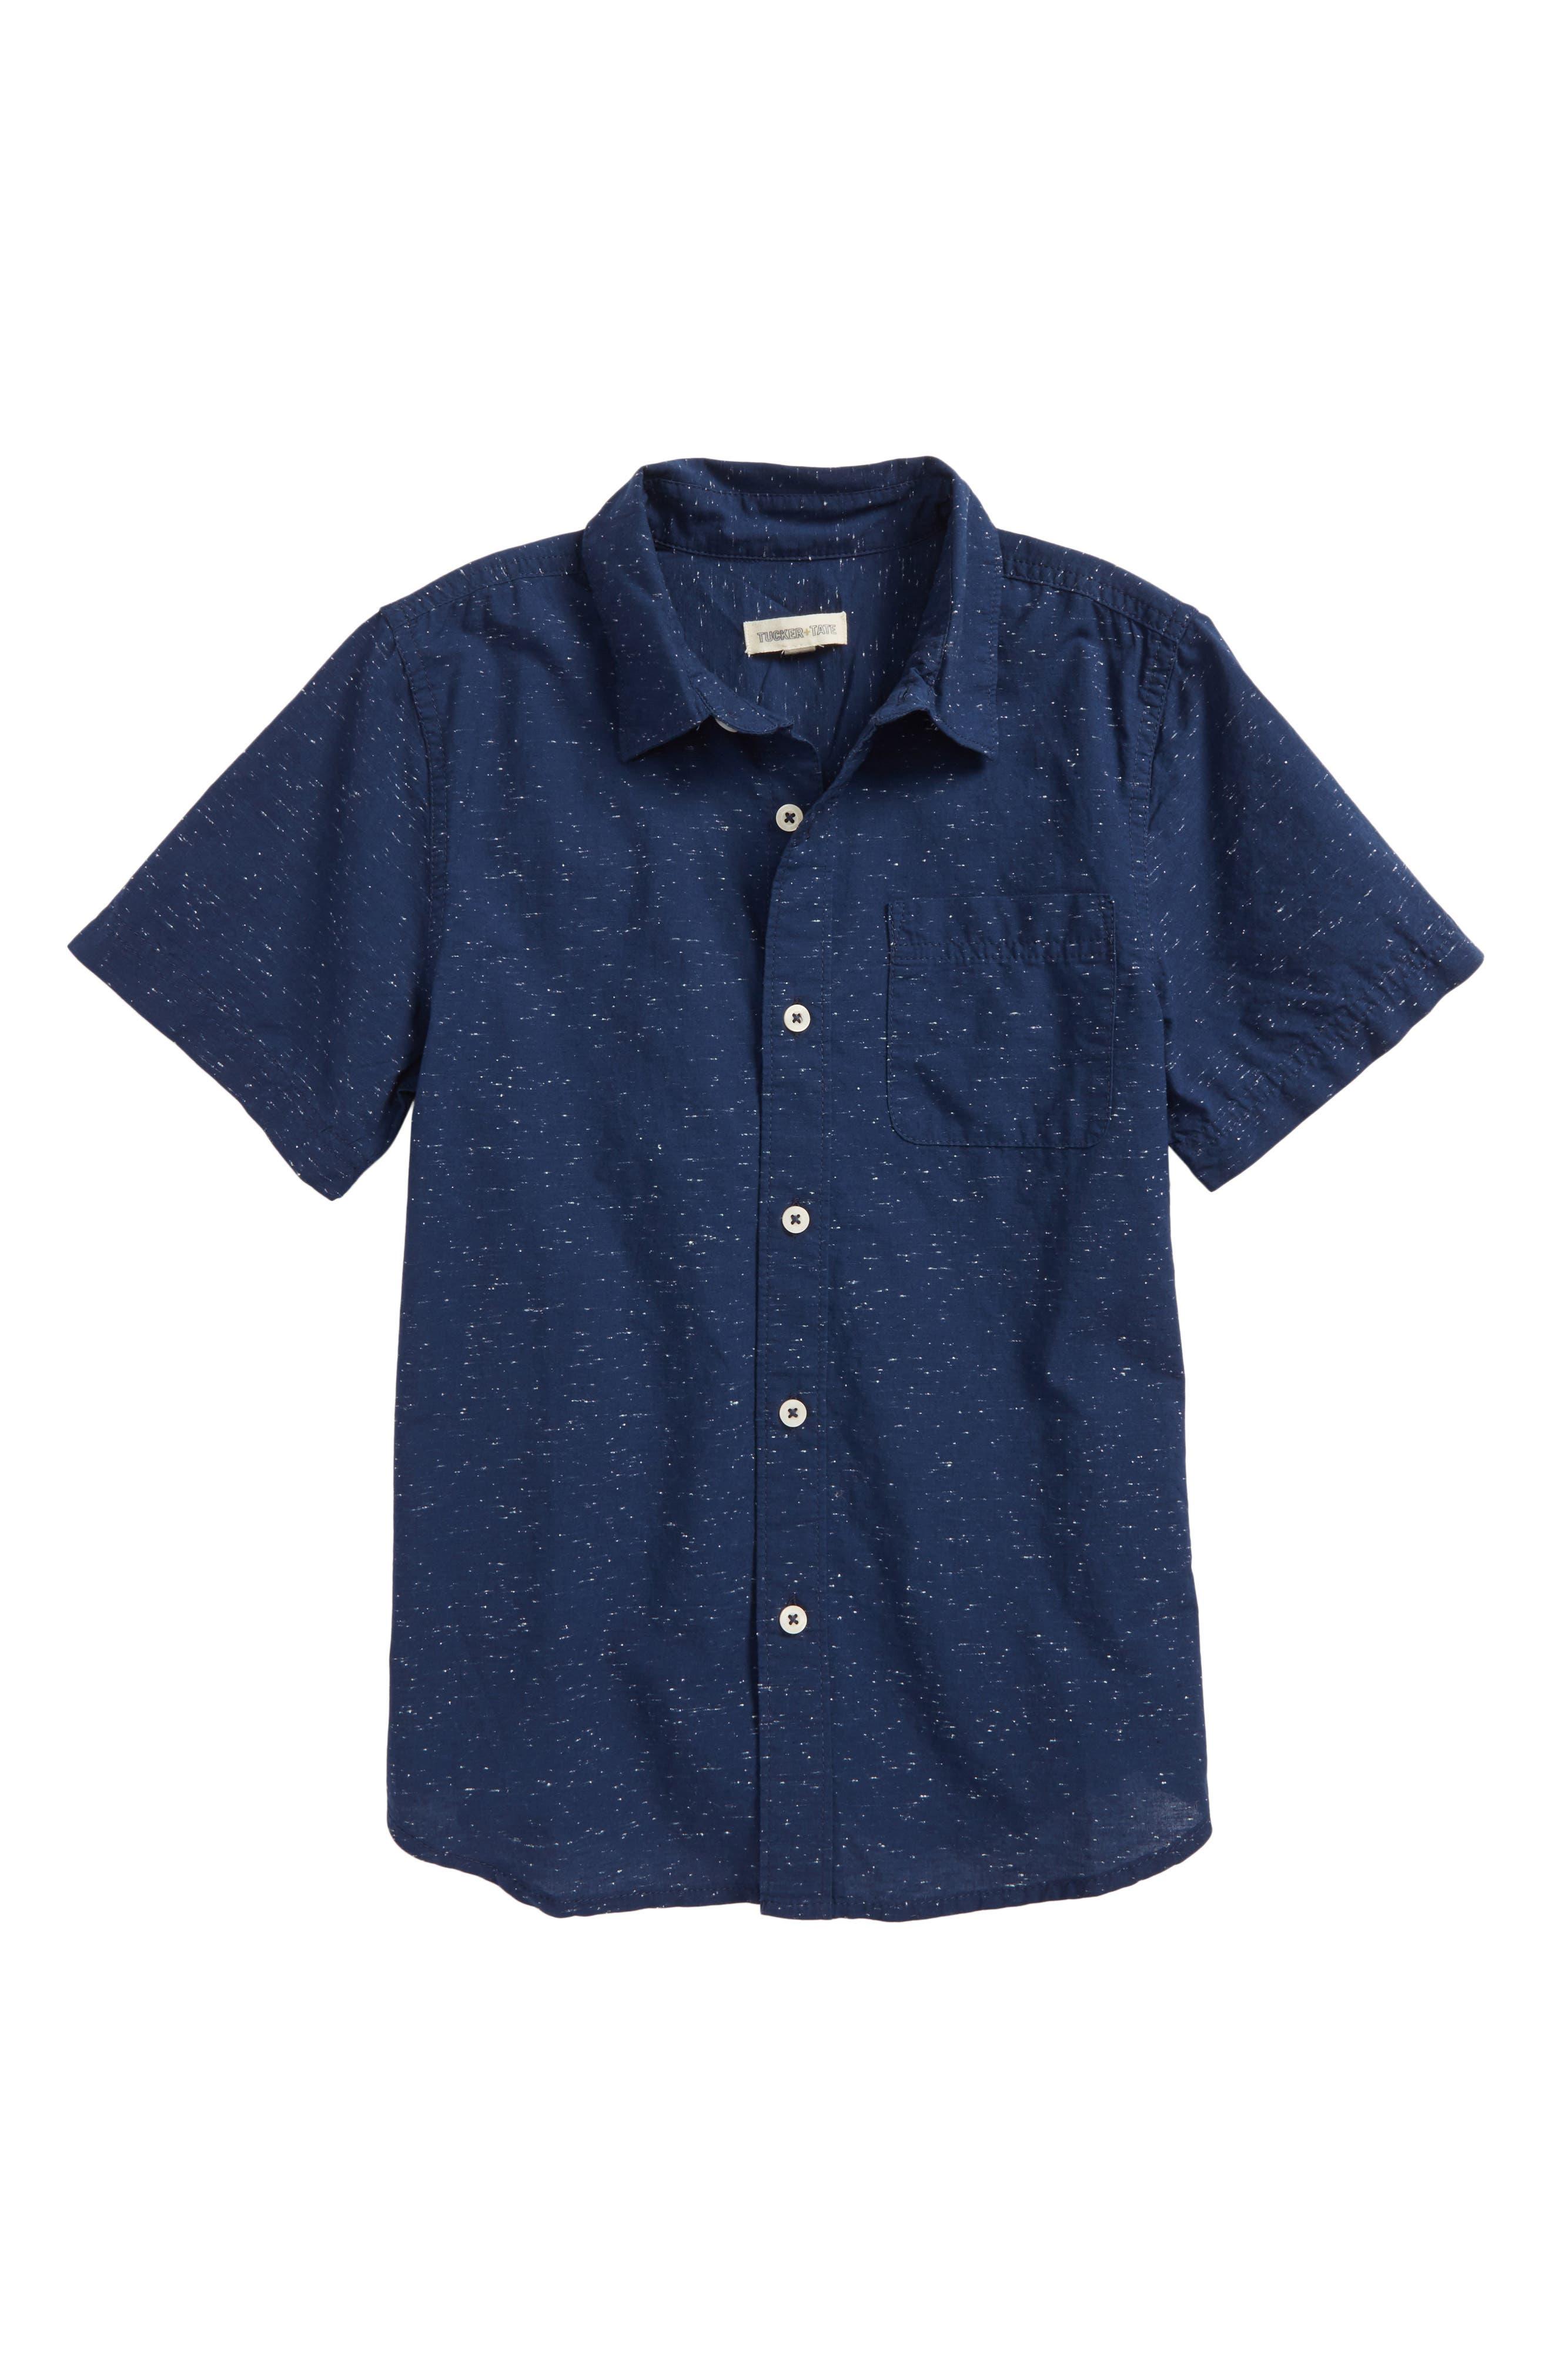 Slub Woven Shirt,                             Main thumbnail 1, color,                             Navy Denim